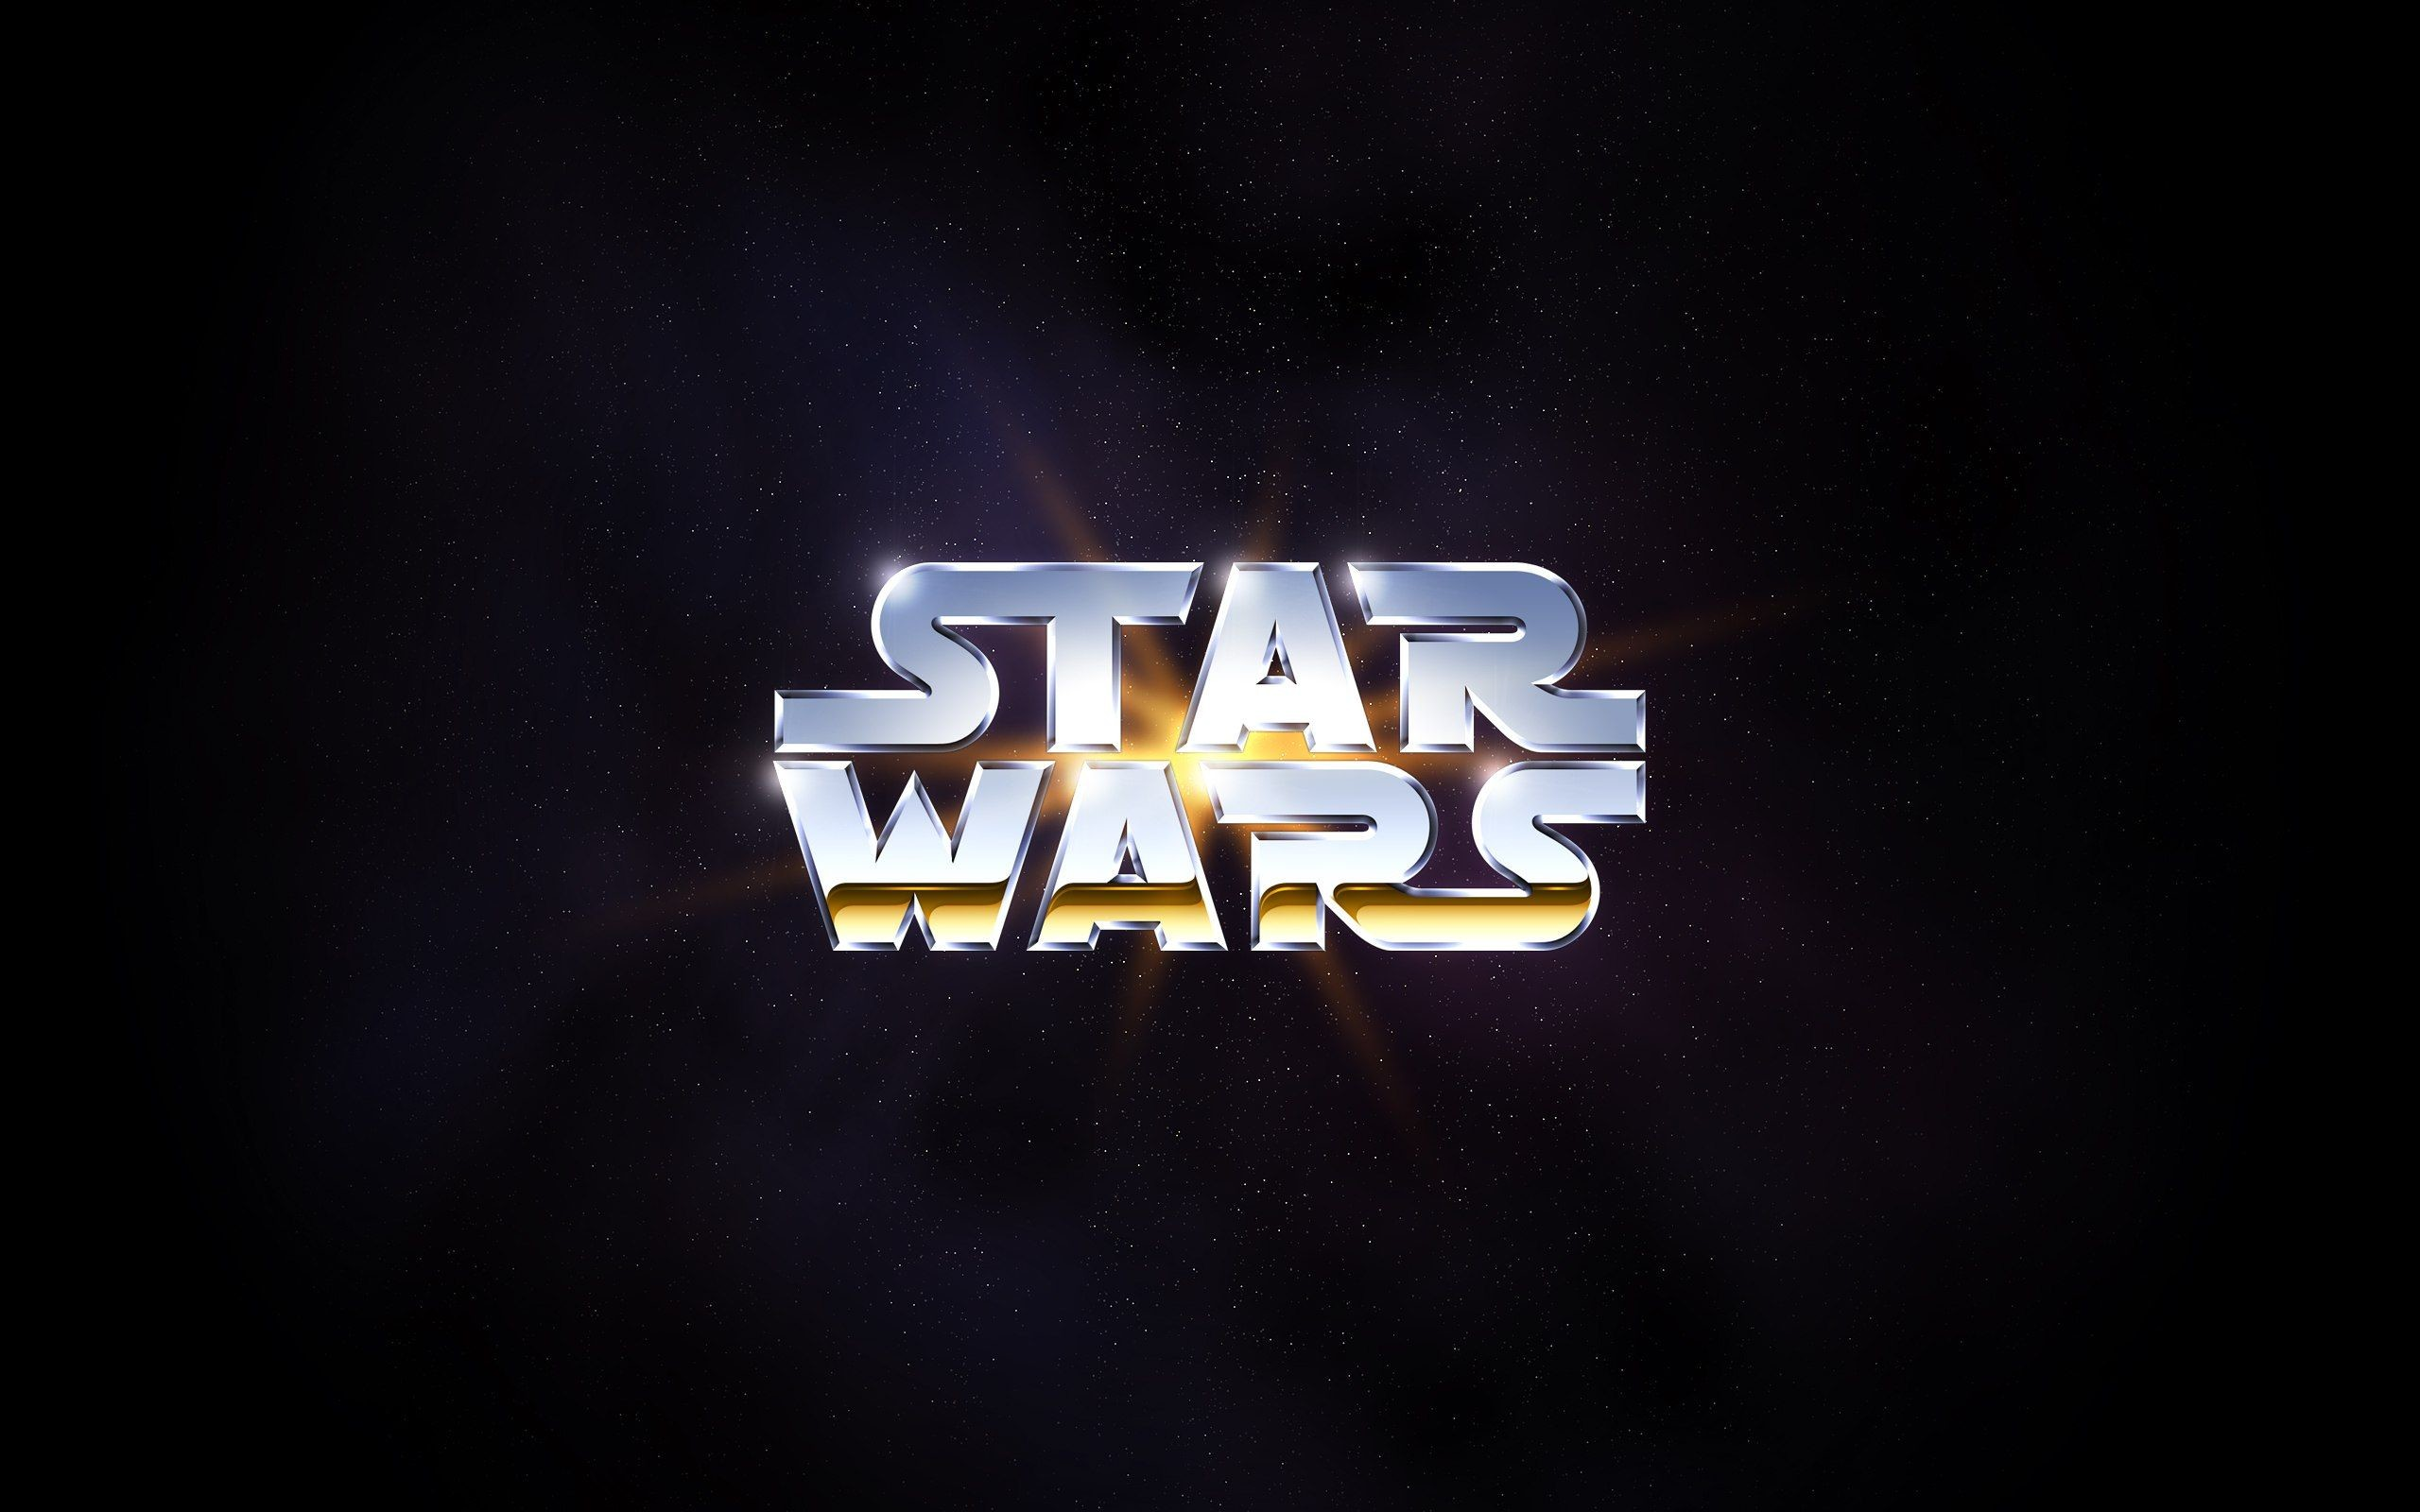 Star Wars Logo Wallpapers – Wallpaper Cave